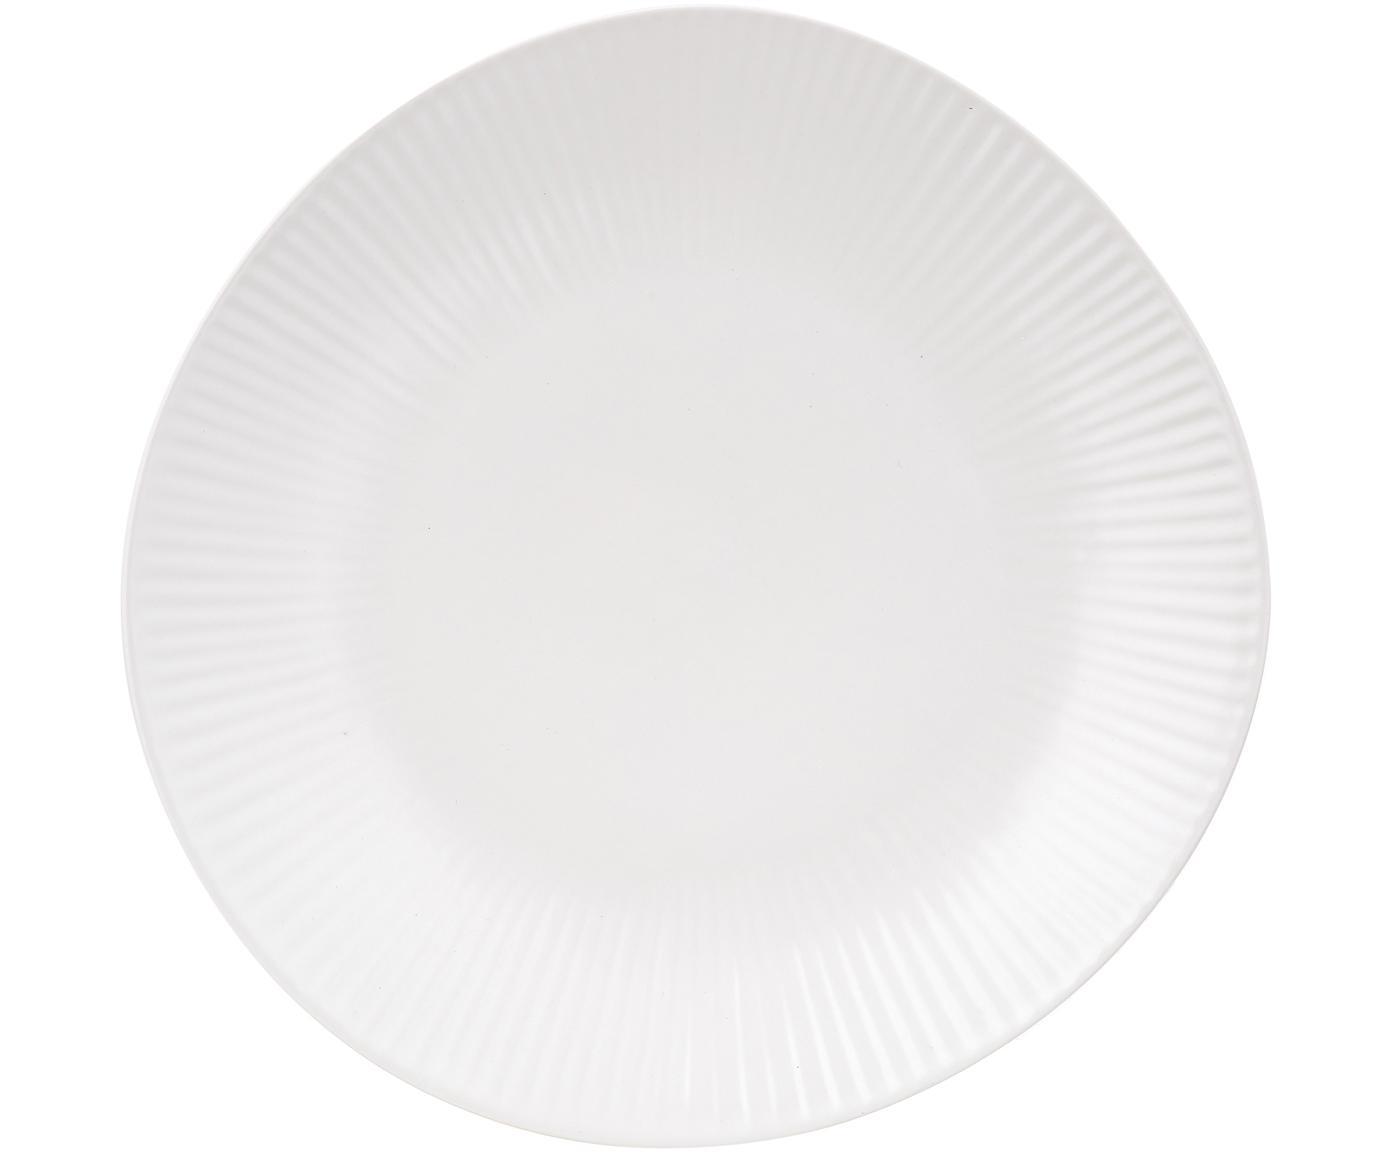 Piatti da dessert fatti a mano Sandvig 4 pz, Porcellana, tinta, Bianco latteo, Ø 22 cm